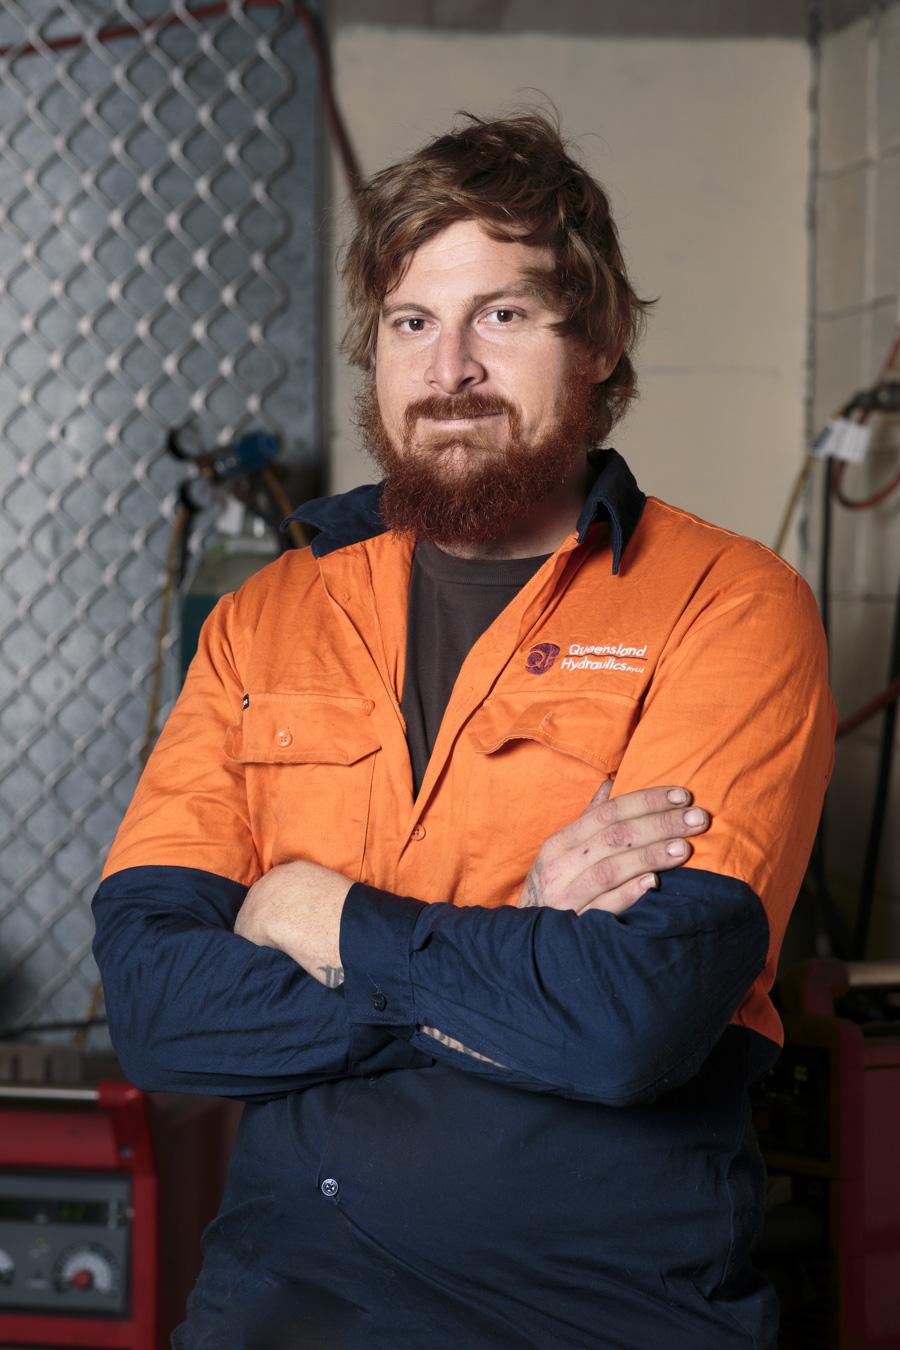 Corey Tradesman